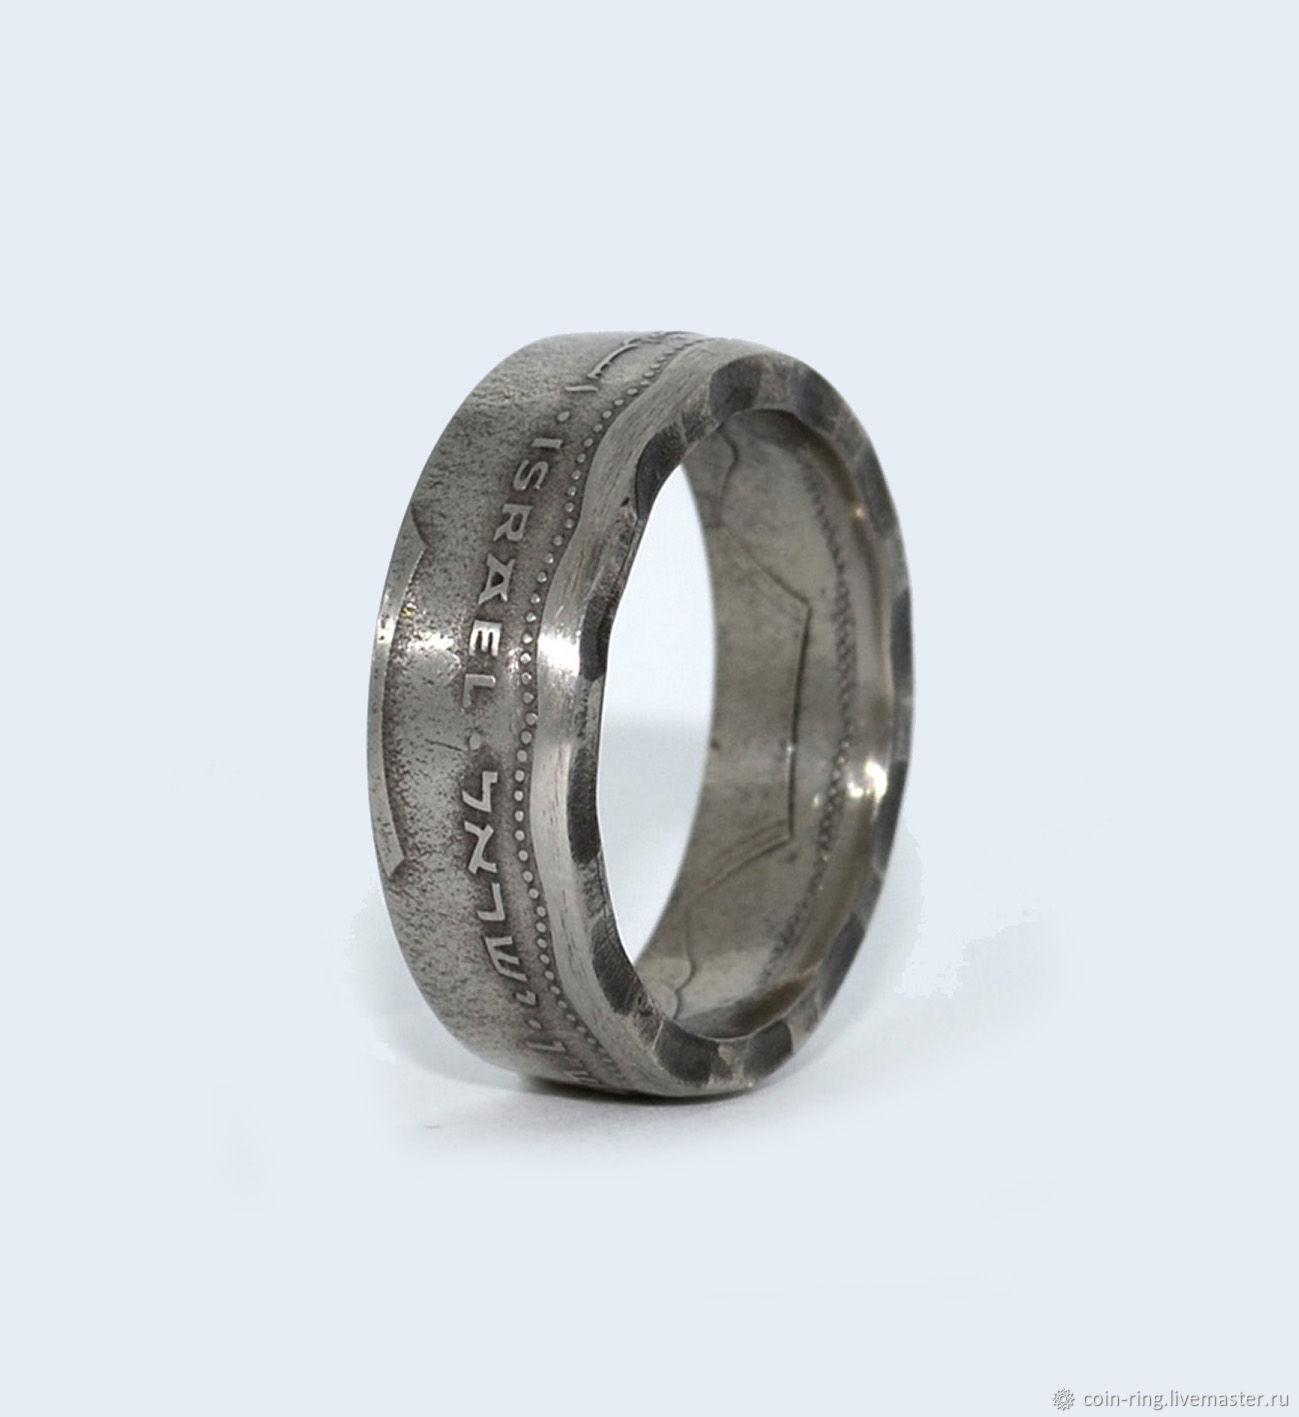 Ring from a twelve-sided coin of Israel 5 new shekels, Rings, Krasnoyarsk,  Фото №1